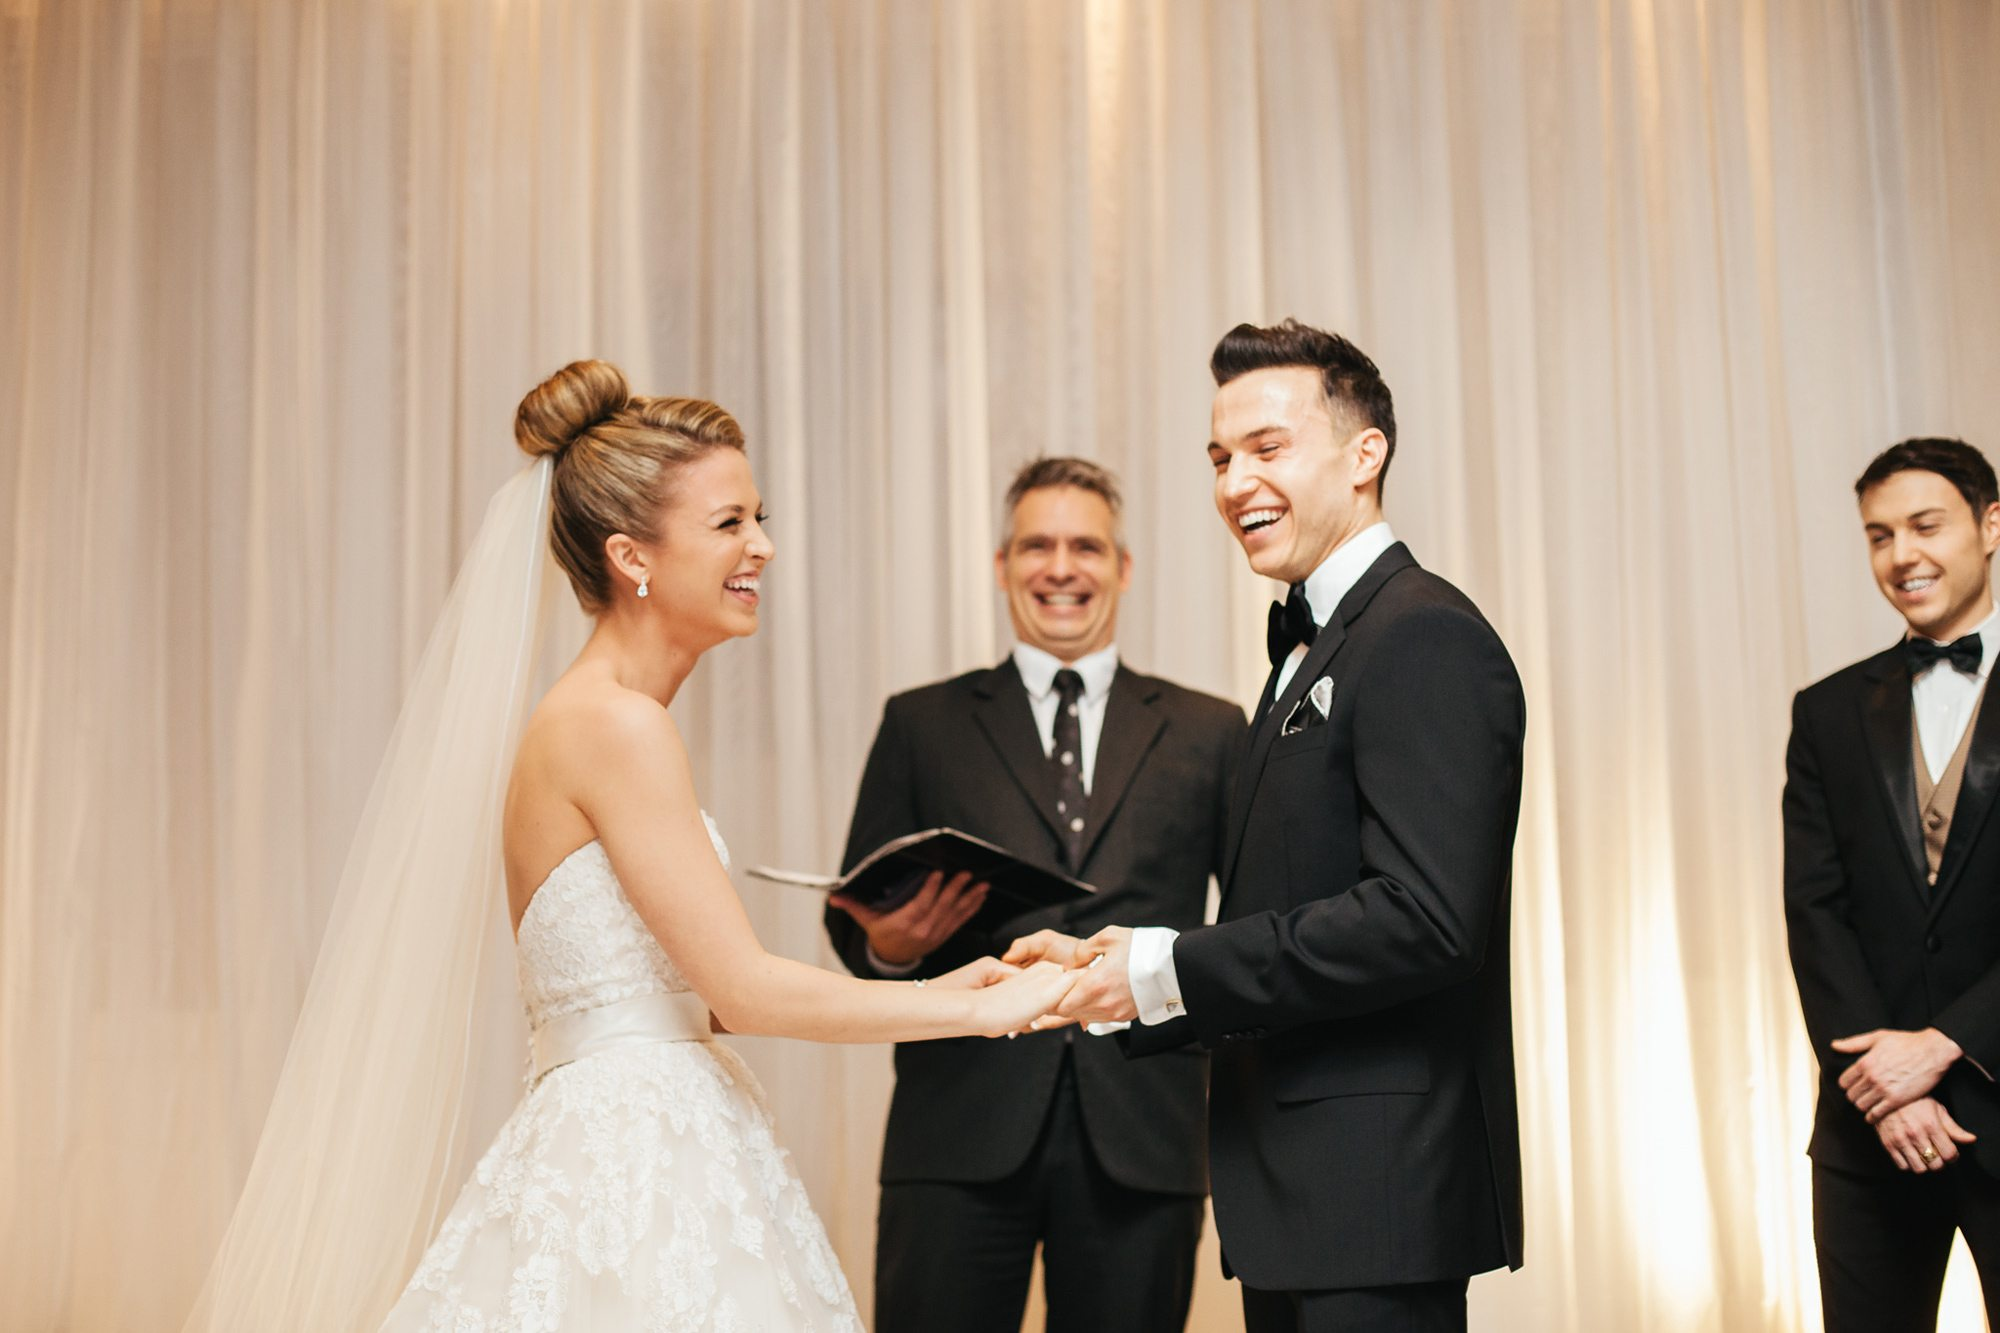 034-vancouver-wedding-photographer